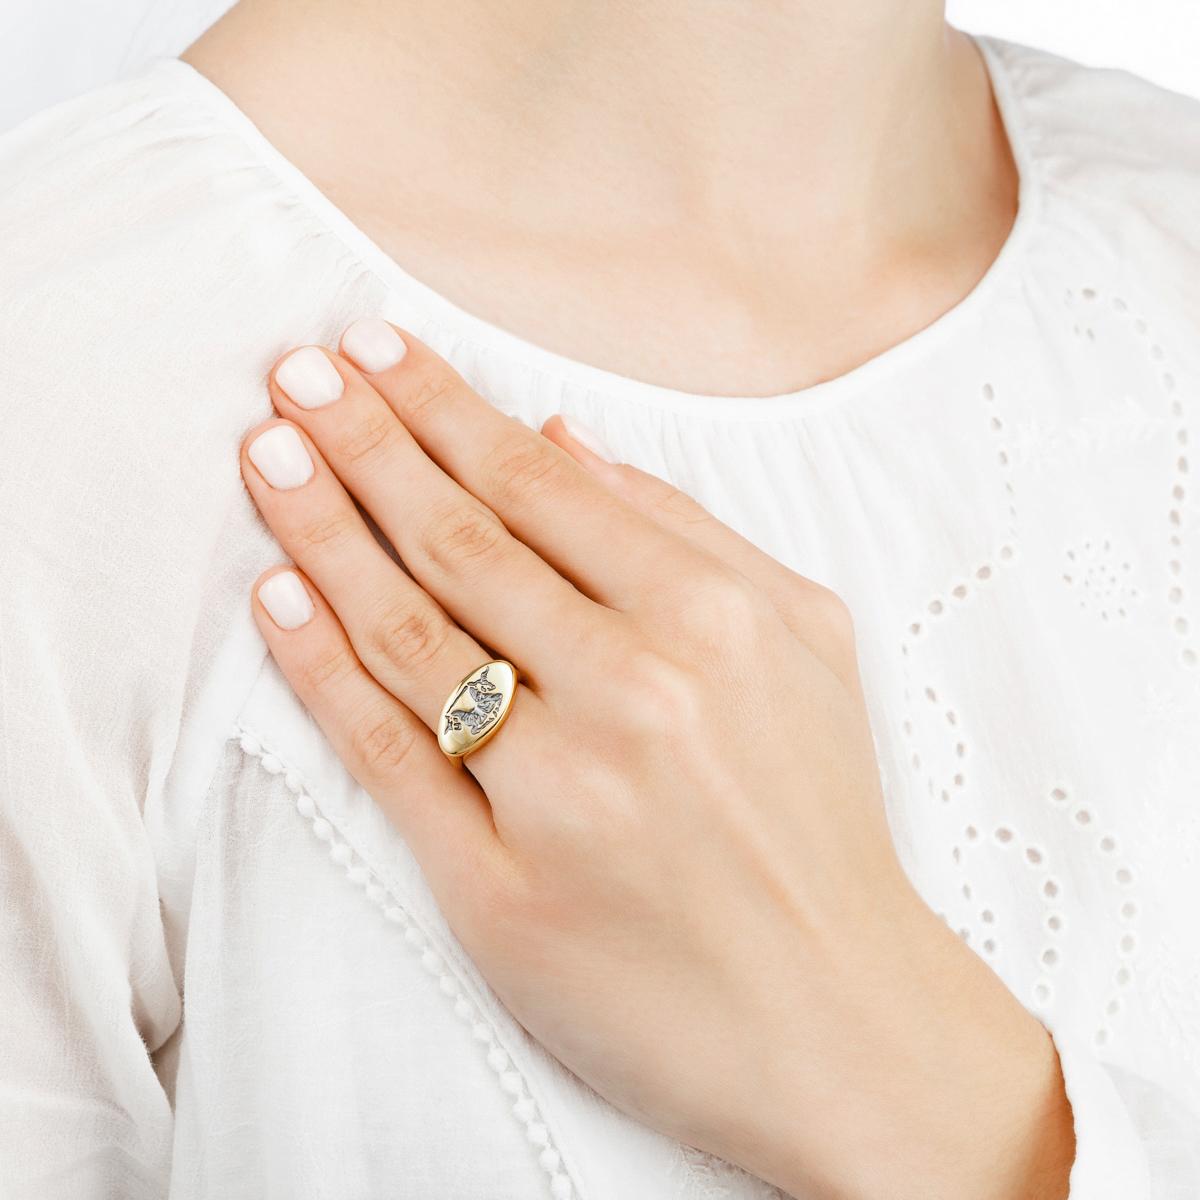 edinorog 1 - Кольцо из серебра «Единорог»